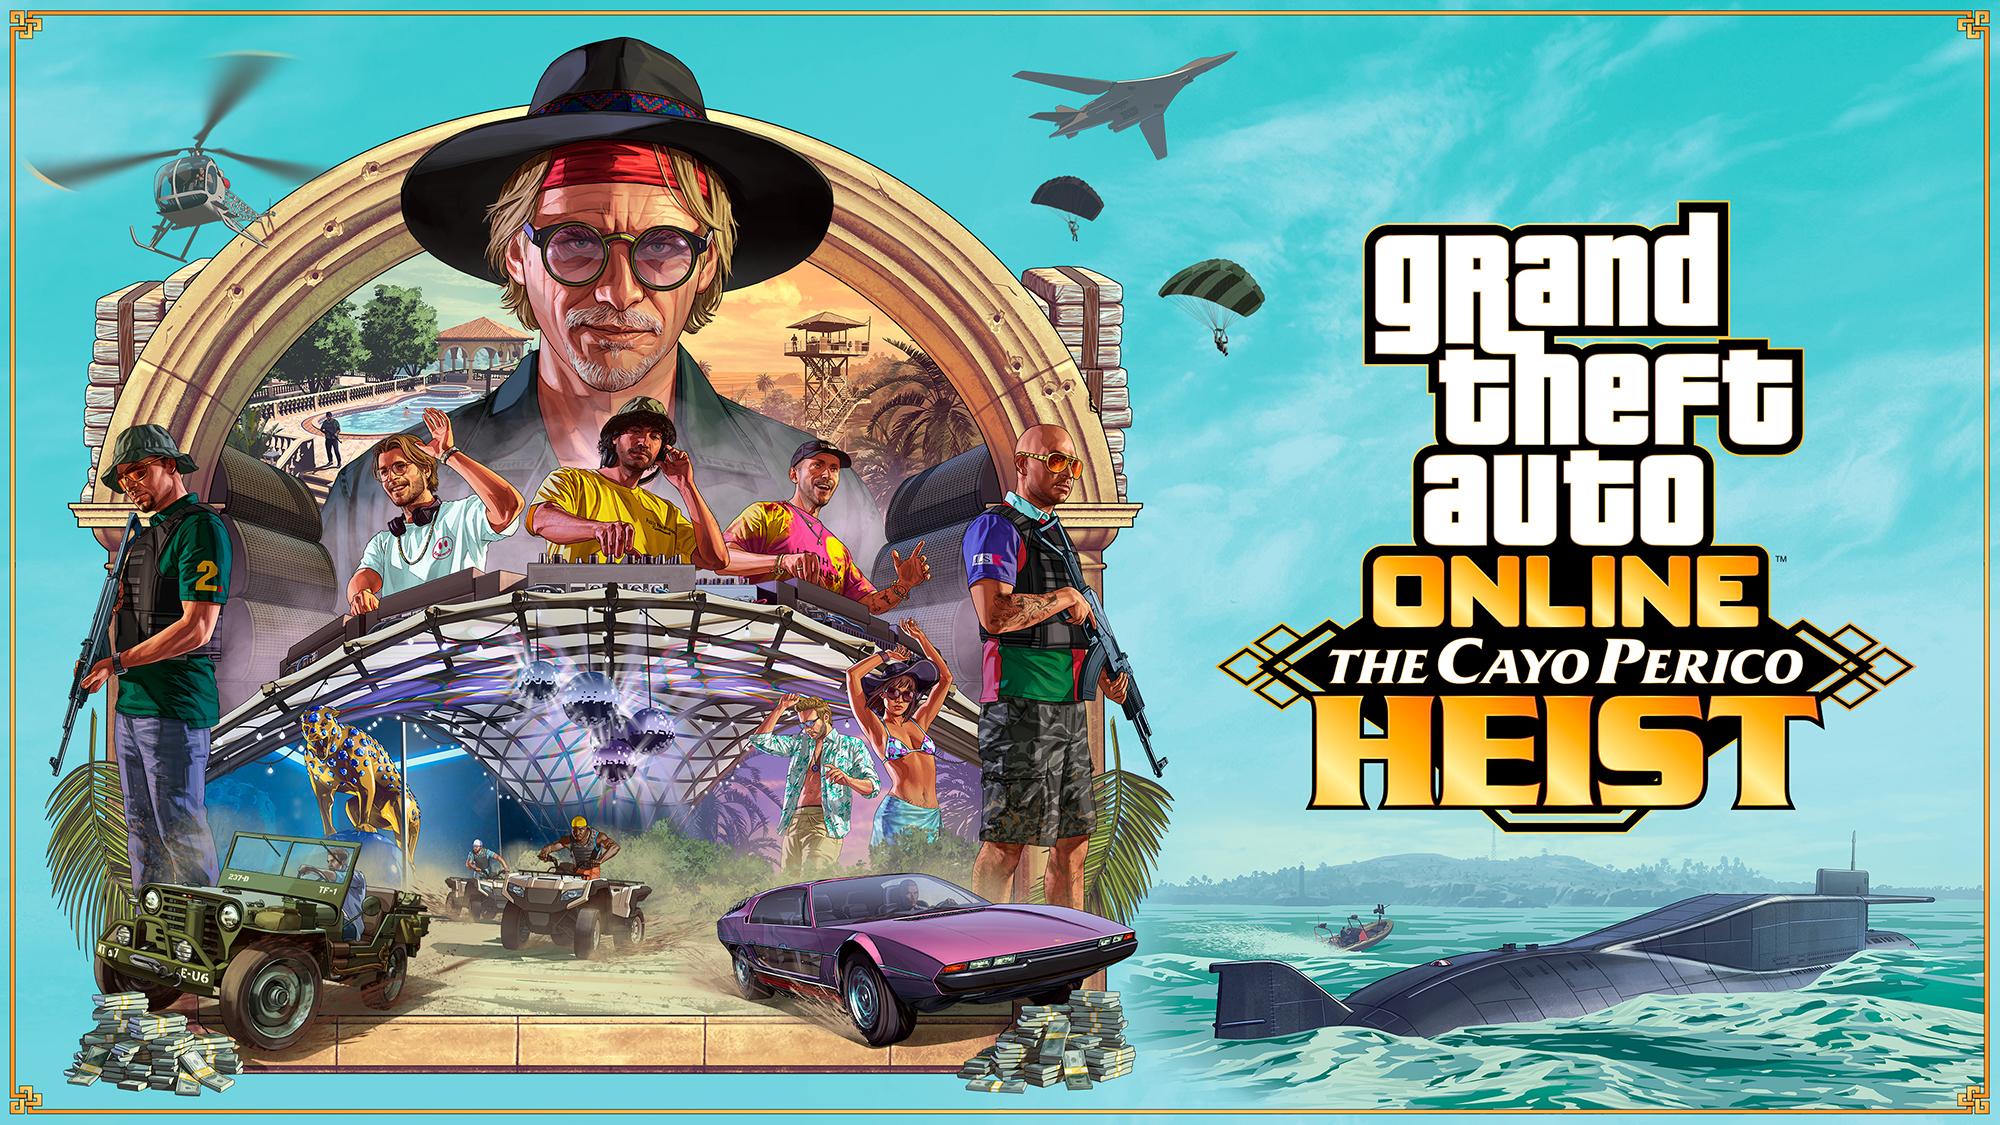 GTA Online: Cayo Perico Heist